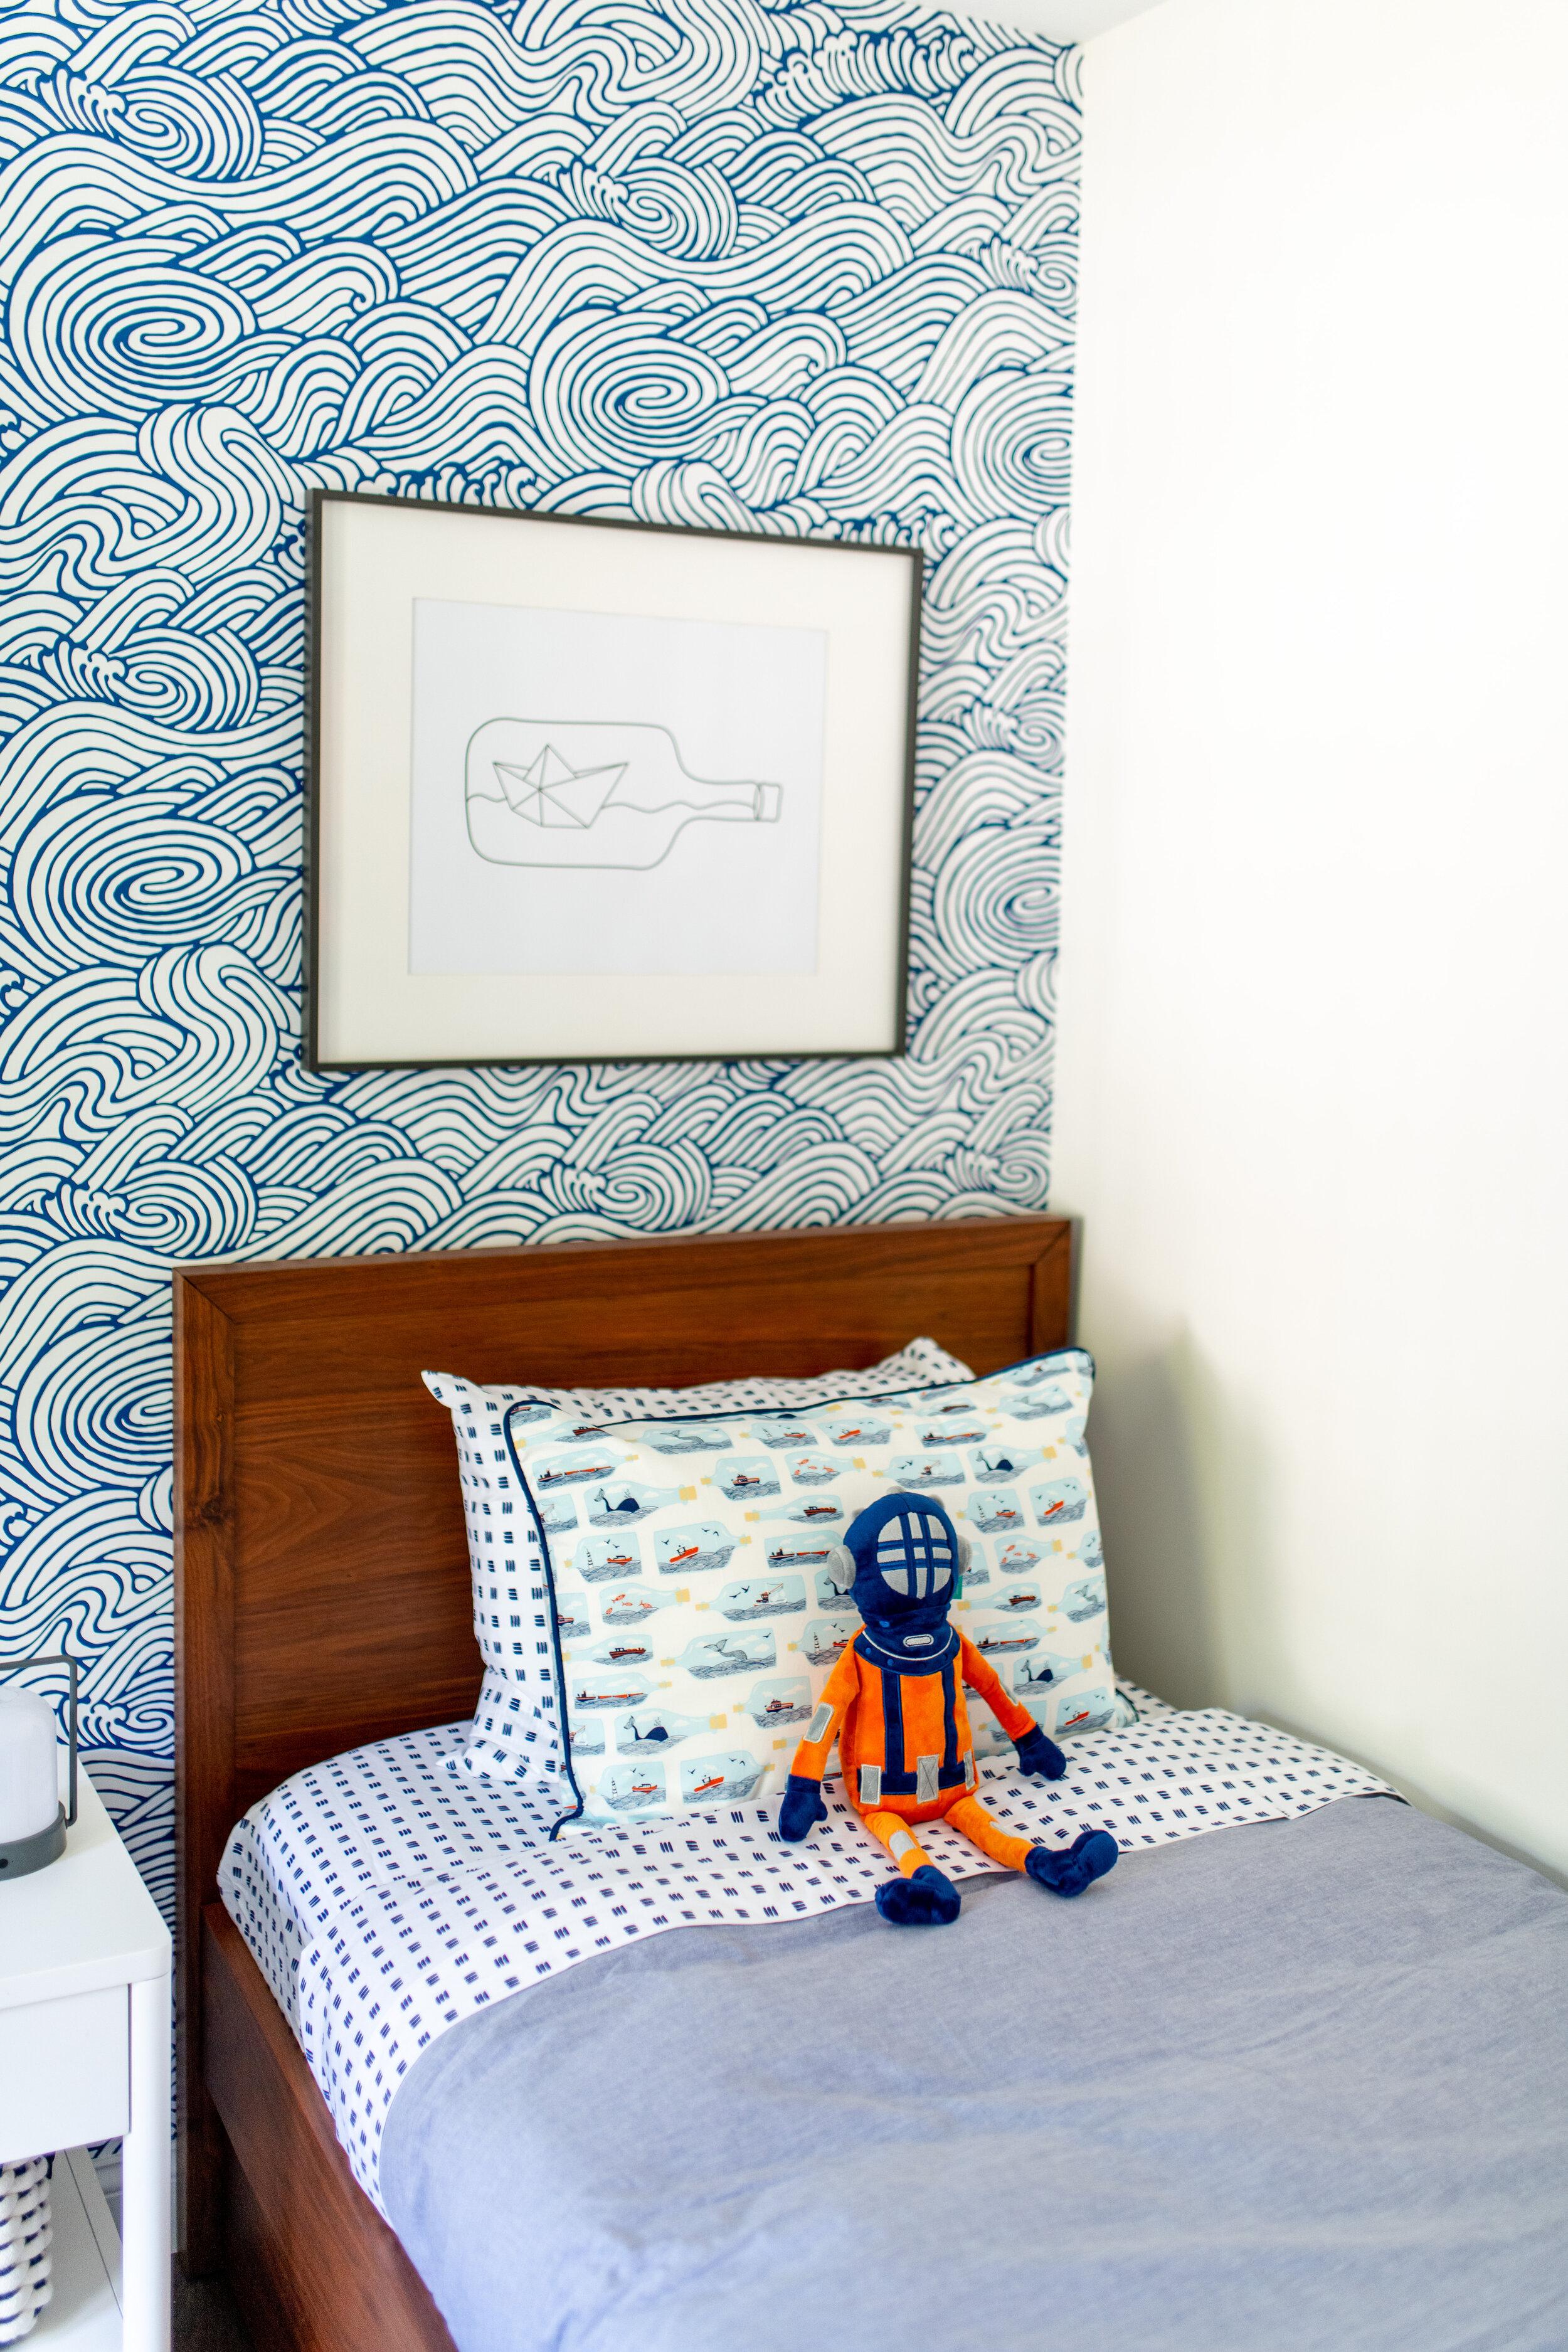 Gray Oak Studio - Prospect Project - Accent Wallpaper Ocean